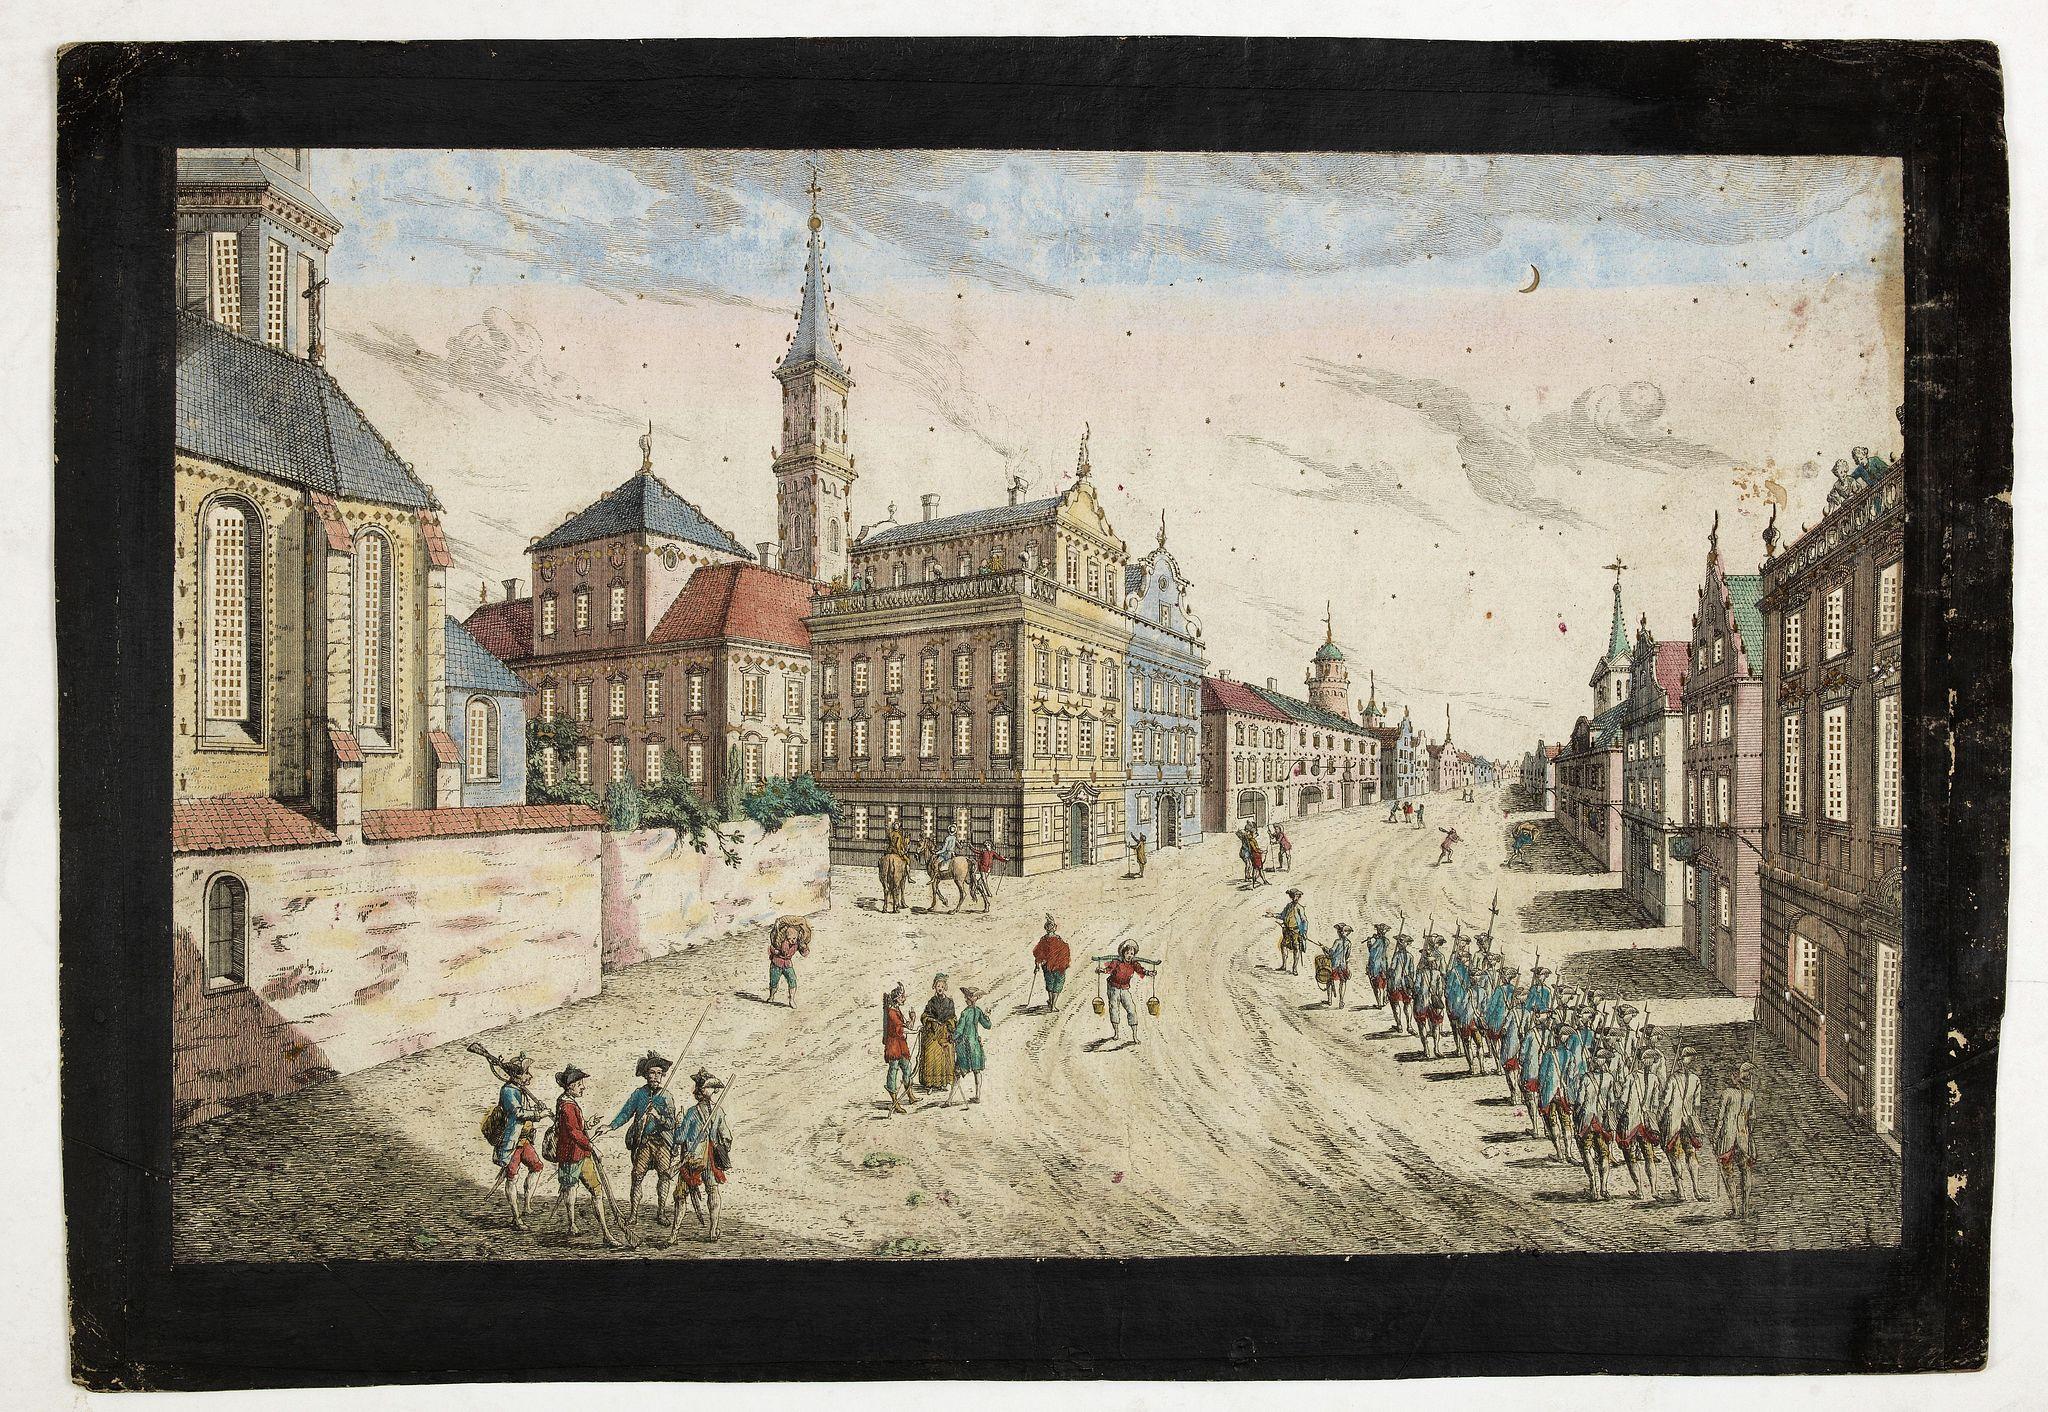 ACADEMIE -  Prospect der Strasse gegen der Kirche der Recolecten in der obern Stadt zu Quebec. Vuë de la Rue des Recolets dans la haute Ville de Quebec.